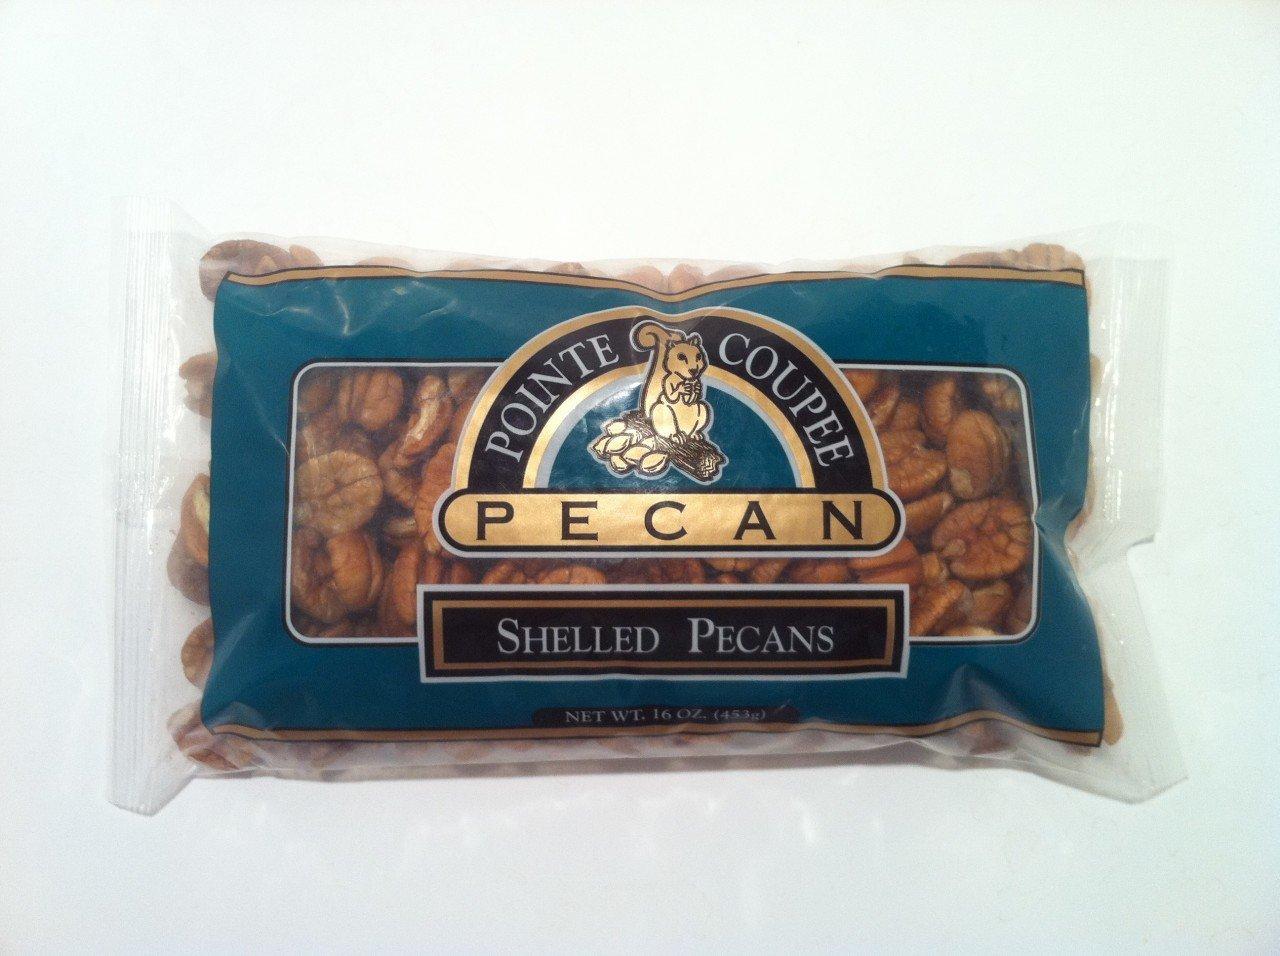 Pointe Coupee Pecan - 1 Lb. Bags Or Case Natural Shelled Pecan Halves